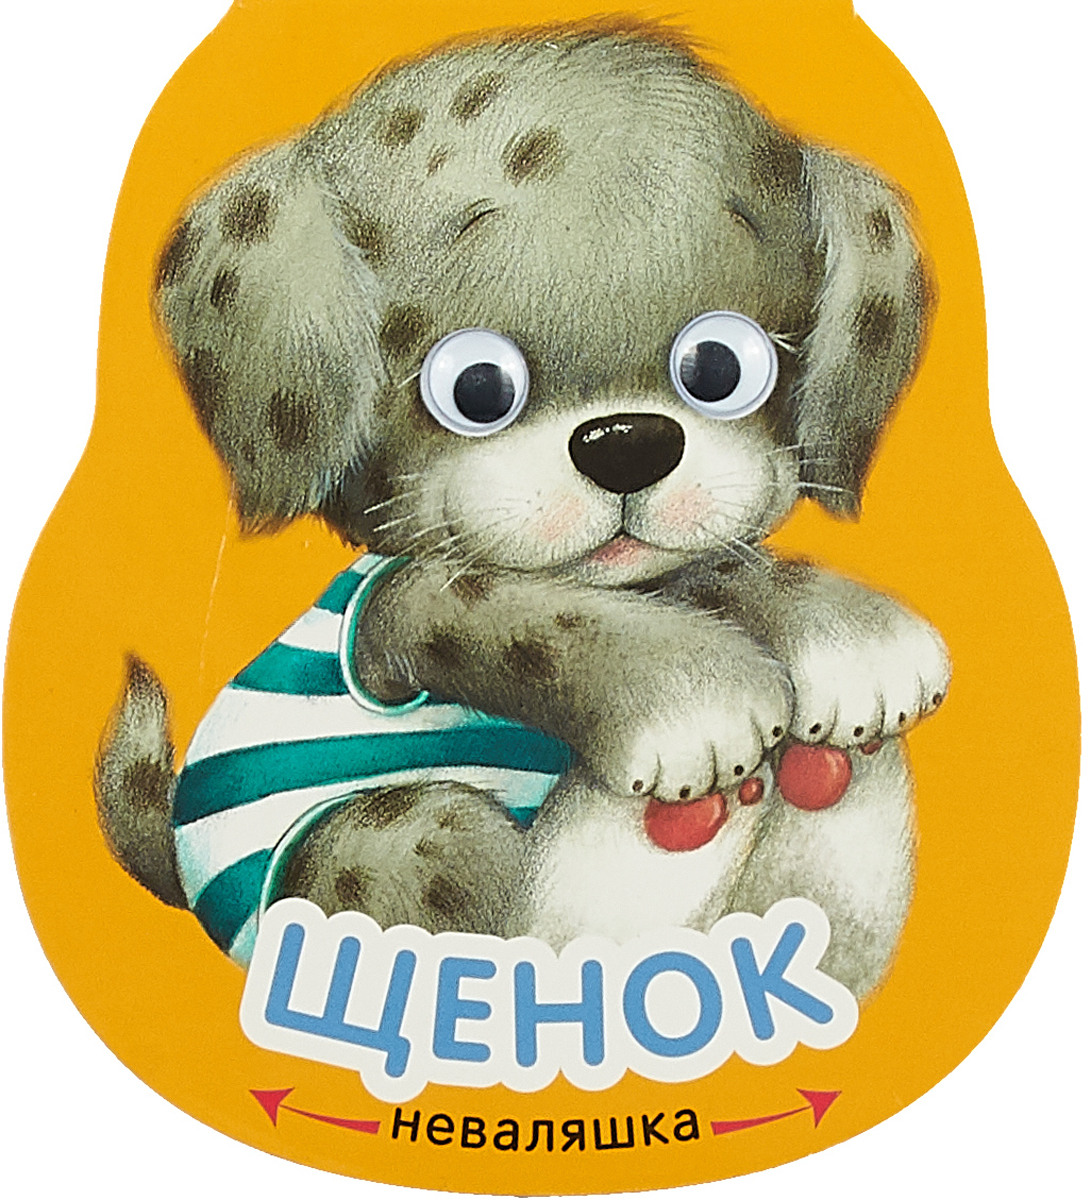 Е. Александрова Щенок. Неваляшки е александрова щенок неваляшки